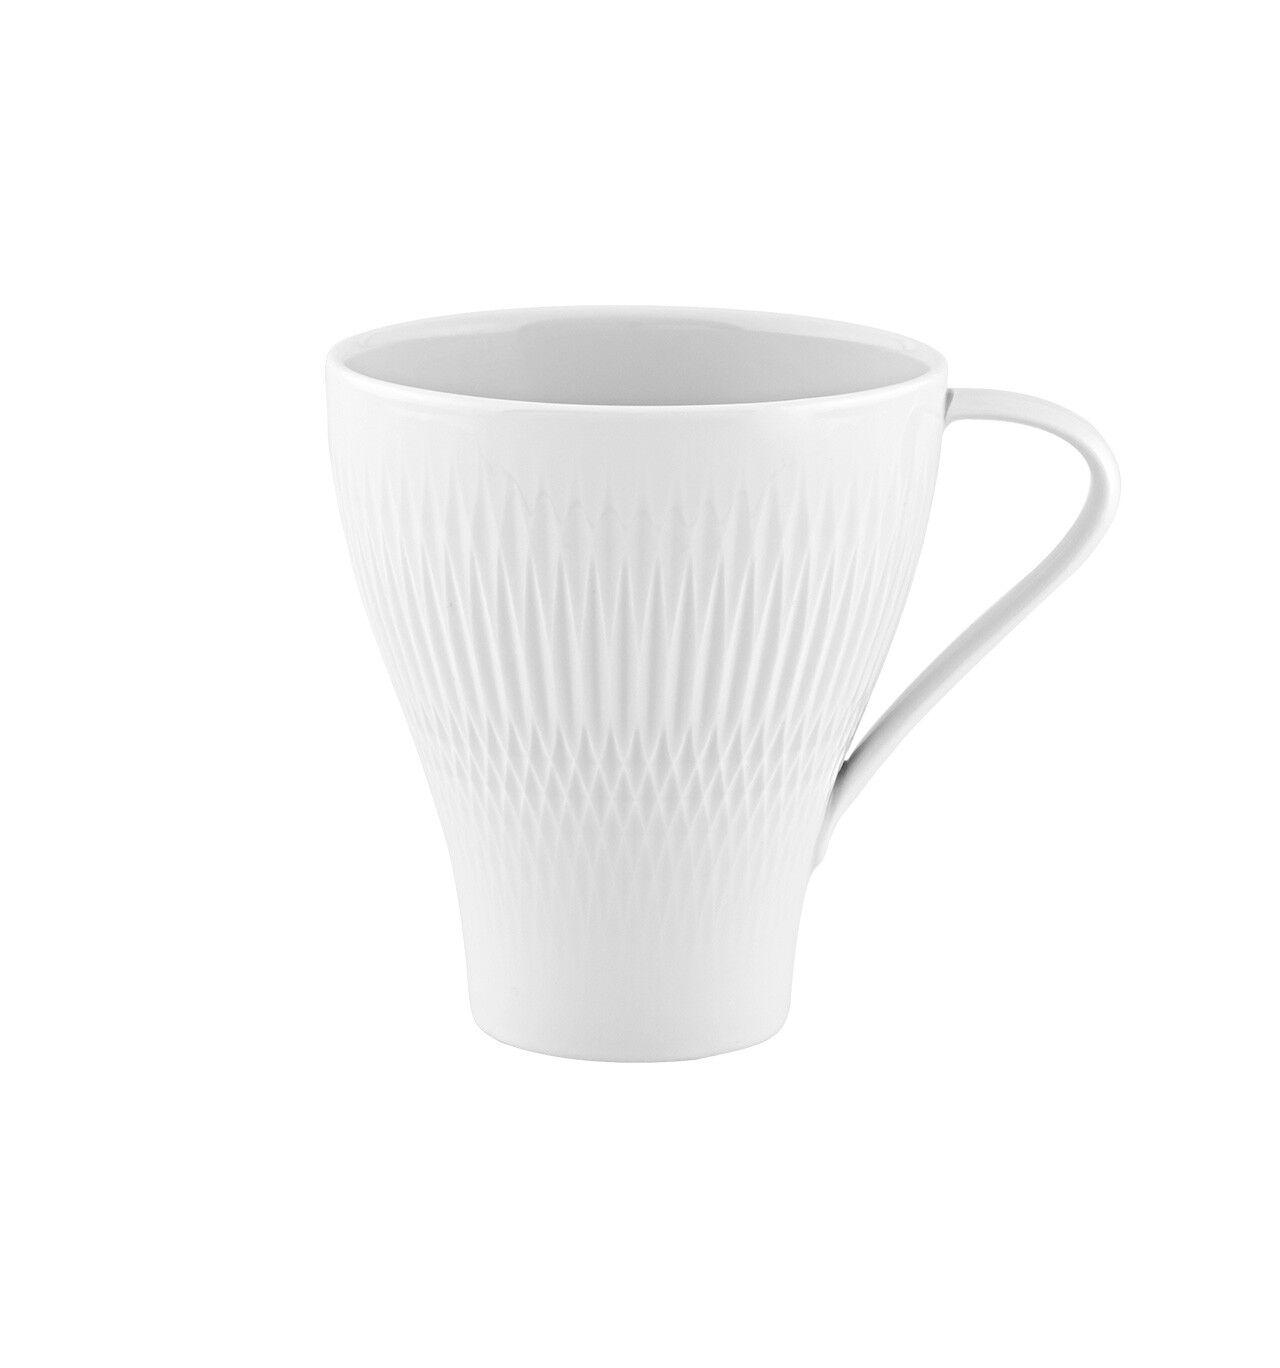 Vista Alegre Utopia Mug - Set of 8